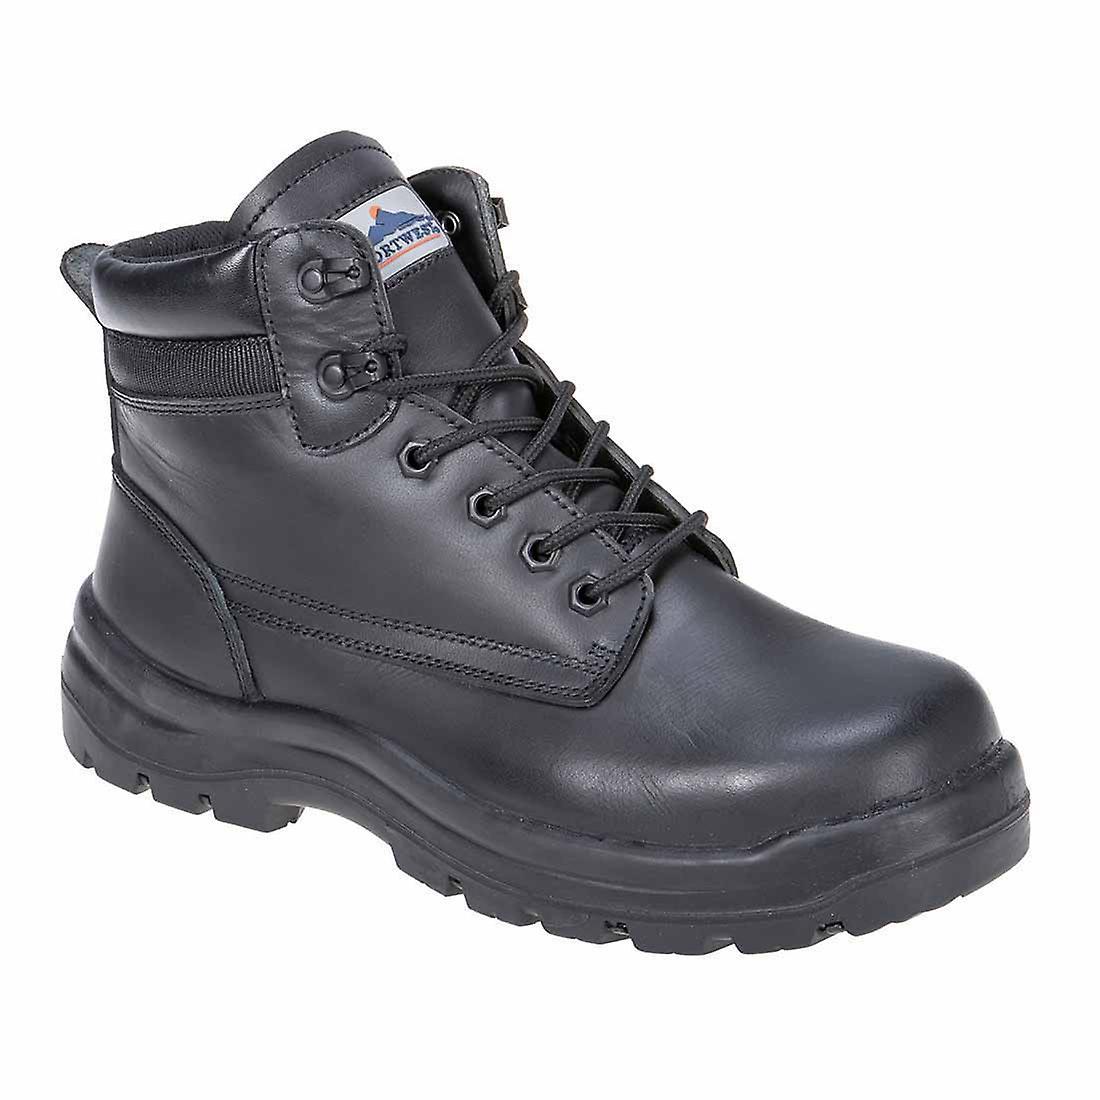 Portwest Workwear Ankle Boot S3 FO HRO Work CI Foyle HI Safety rtwqxrg7